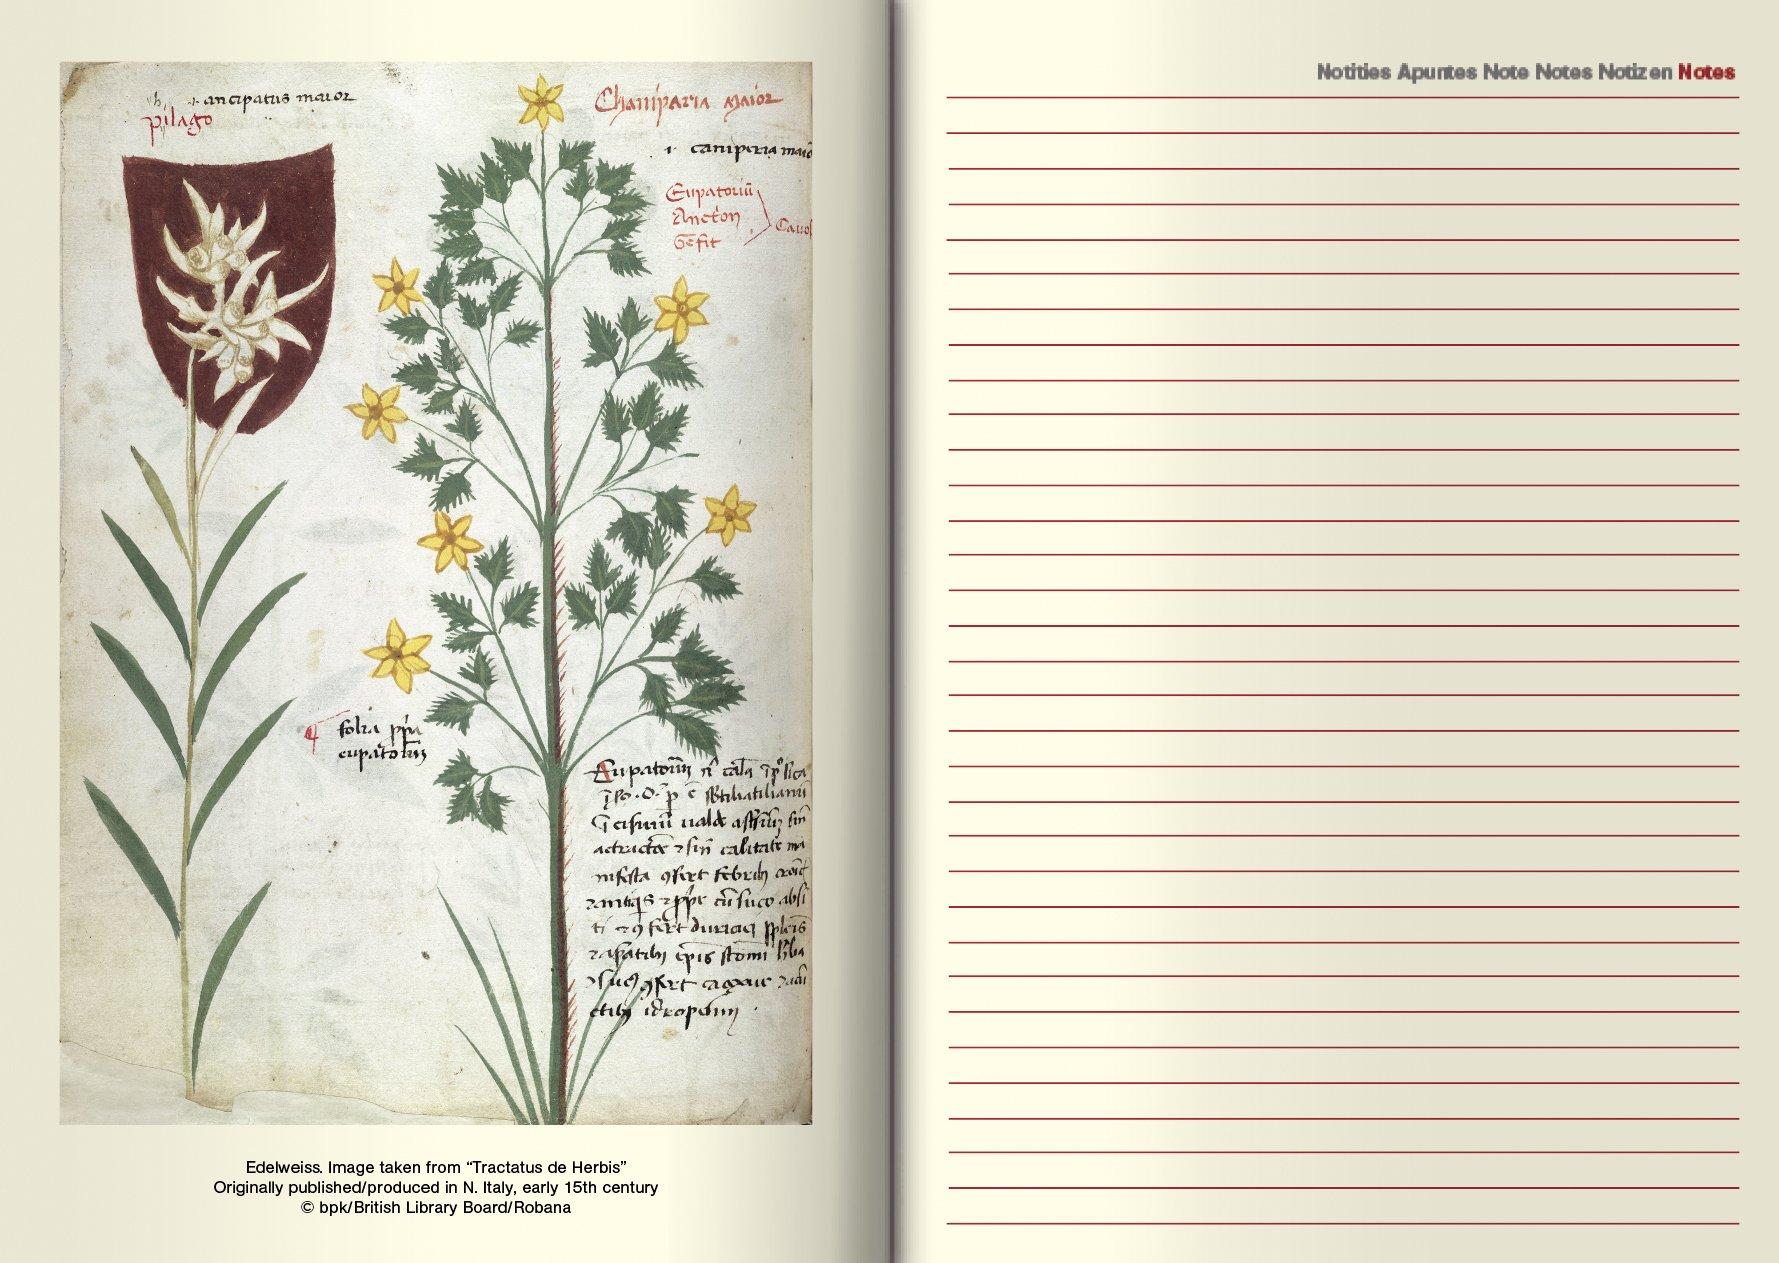 2017 Antique Books Diary - teNeues Large Magneto Diary - 16 x 22cm:  Amazon.co.uk: teNeues: 4002725783837: Books